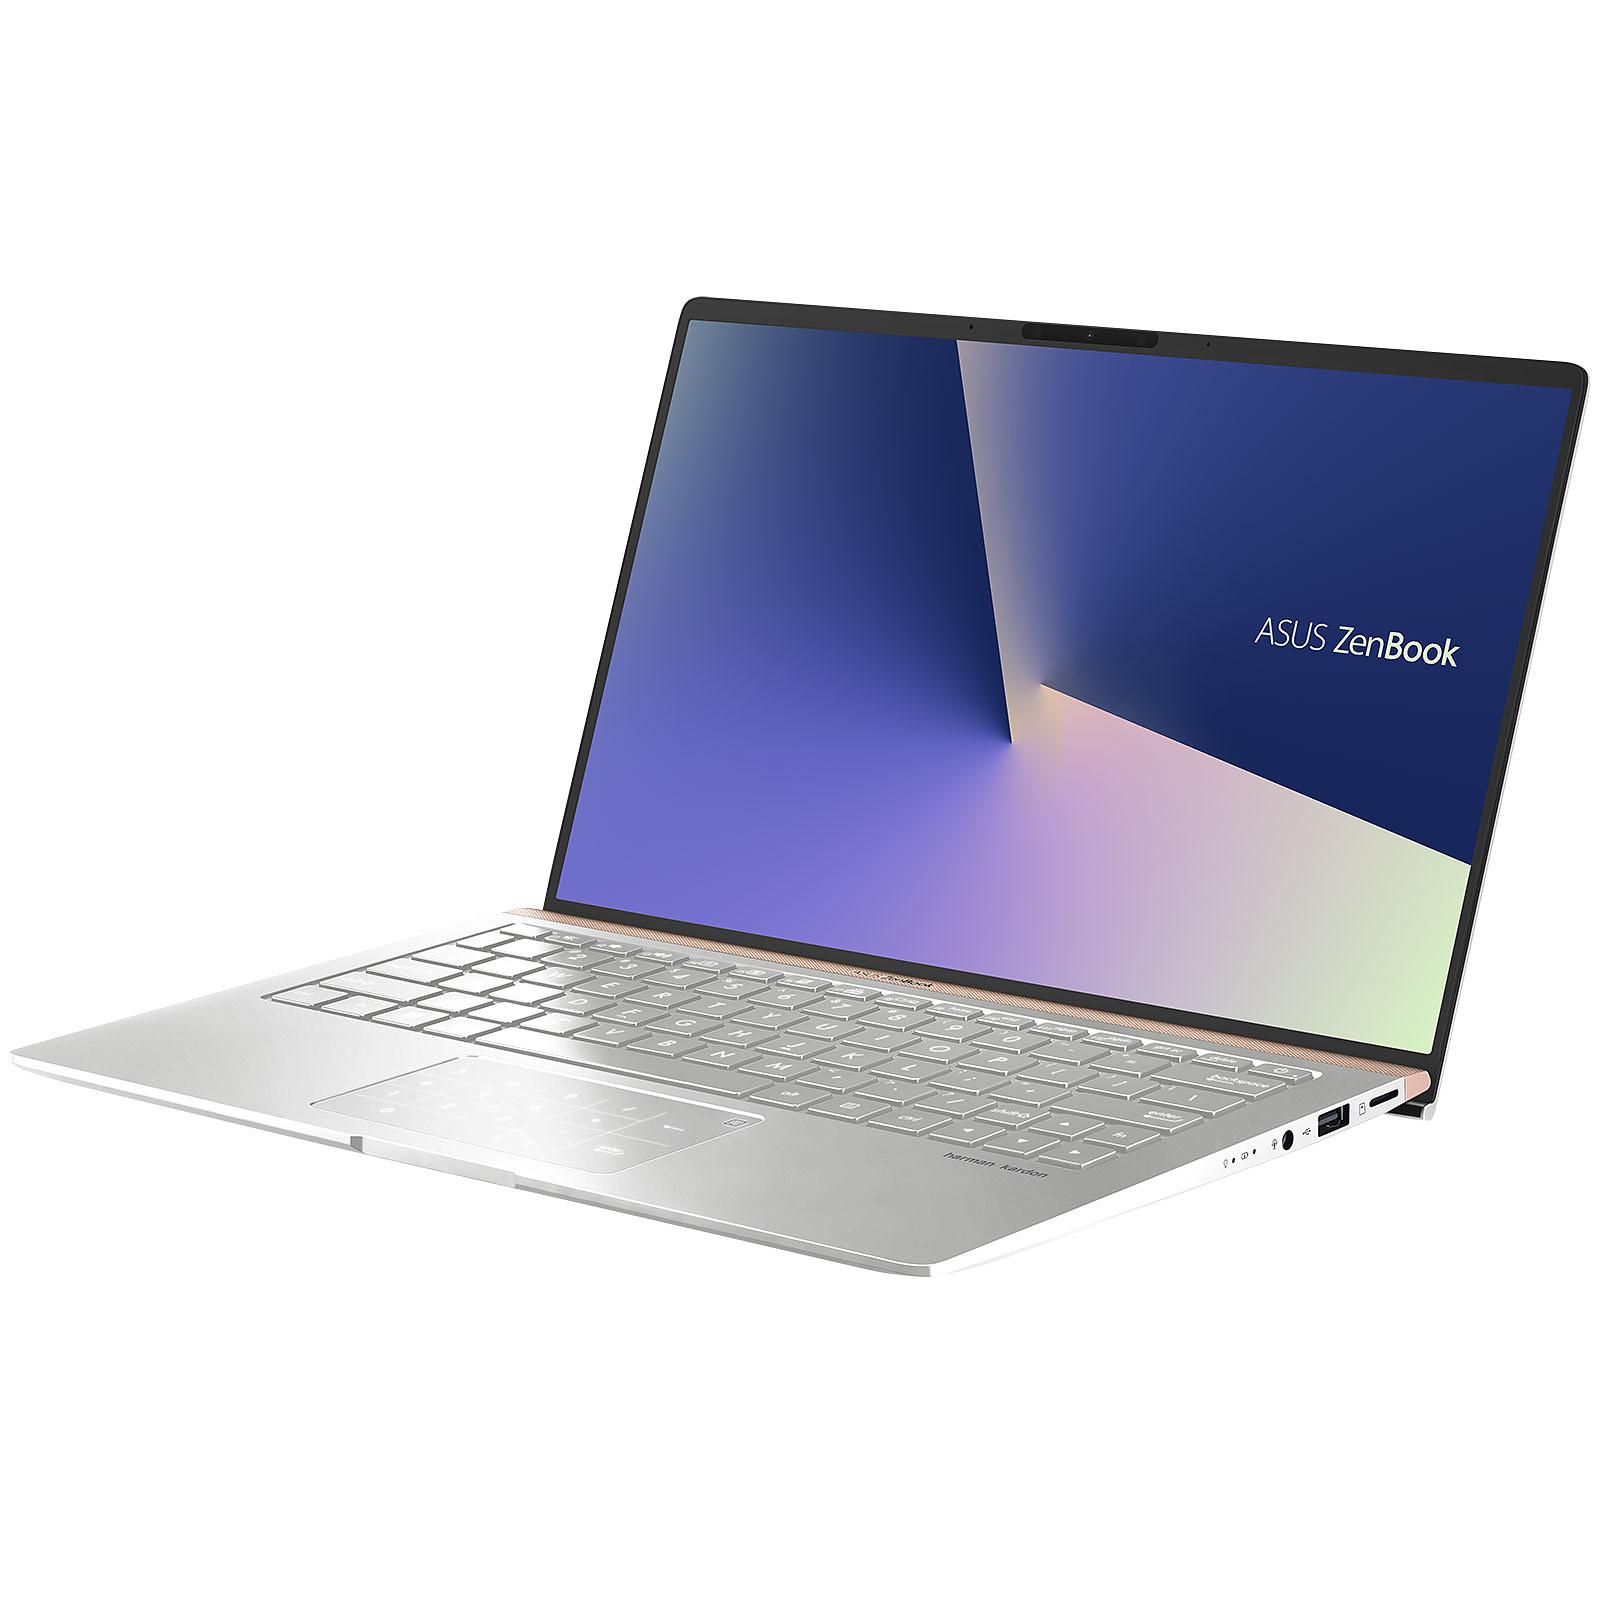 Asus 90NB0JV2-M02390 - PC portable Asus - Cybertek.fr - 4